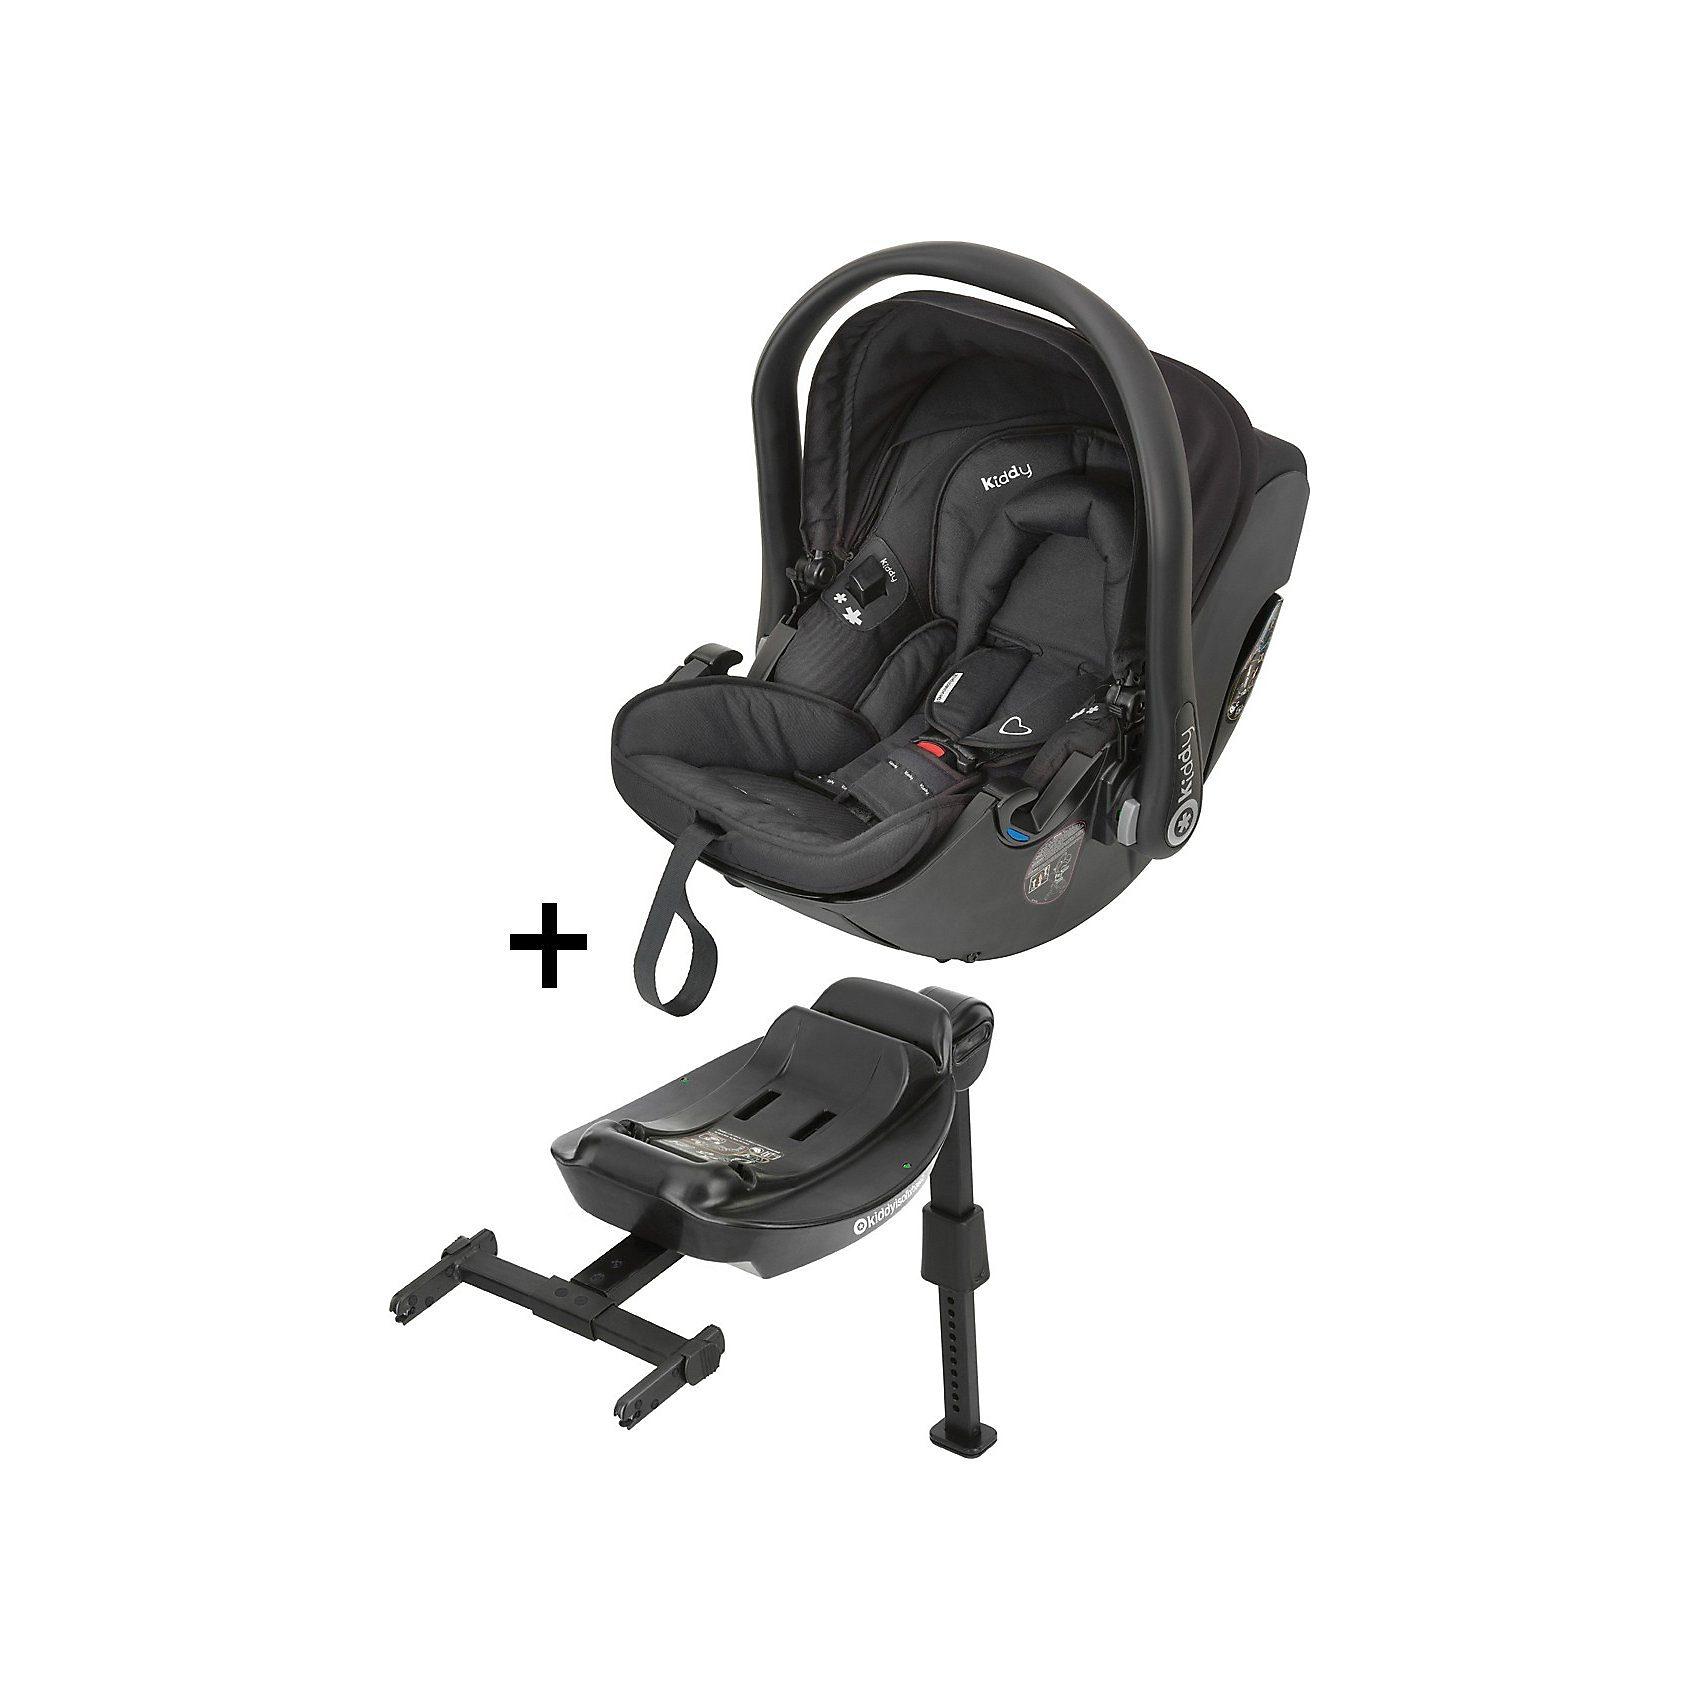 Kiddy Babyschale Evolution Pro 2 mit Isofix Base 2, racing black